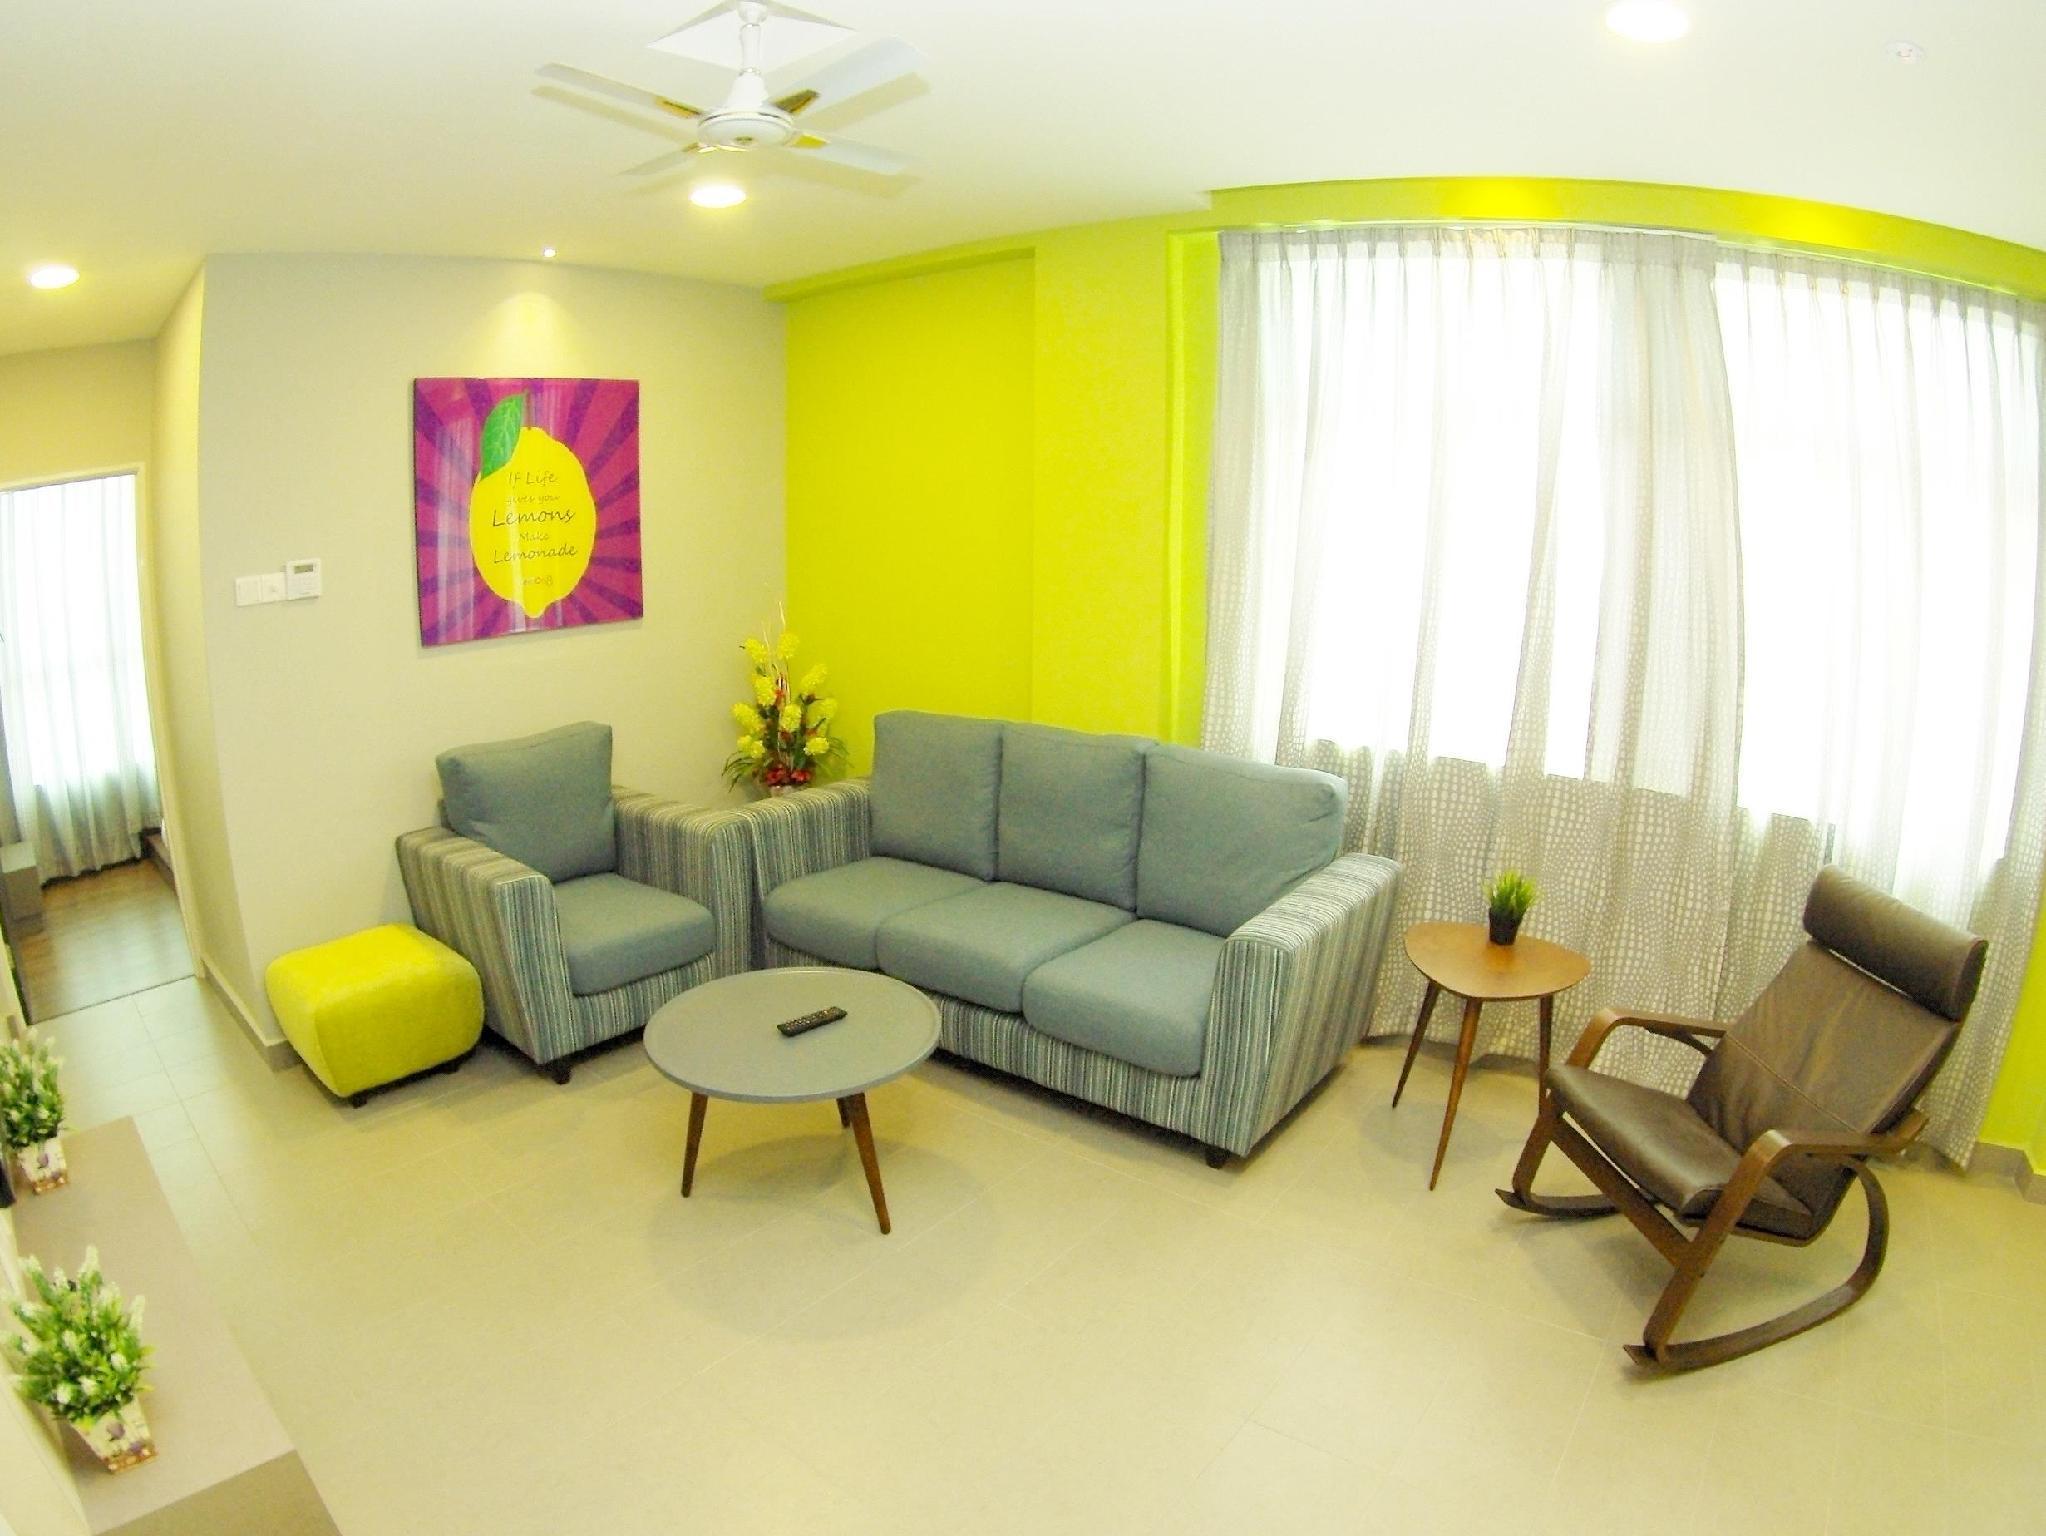 Lemon 8 Hotel Apartment Malacca Promo Harga Terbaik